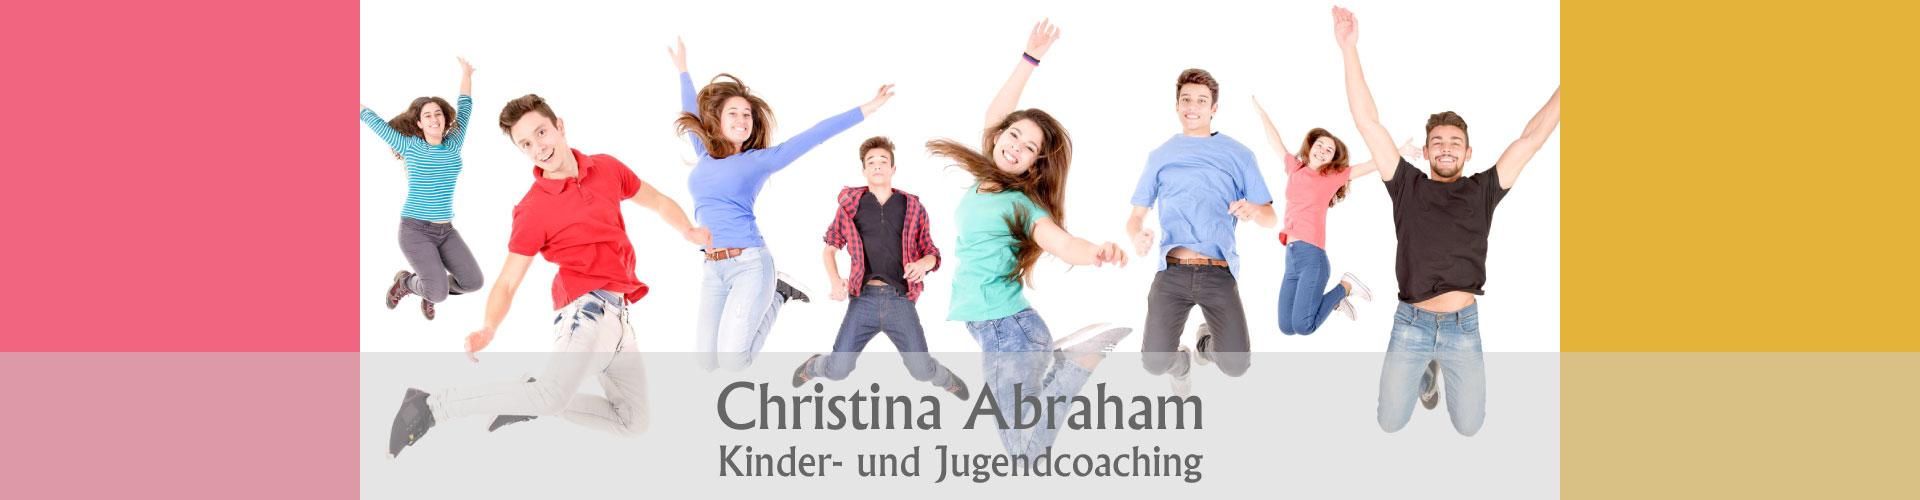 Jugendcoaching Christina Abraham